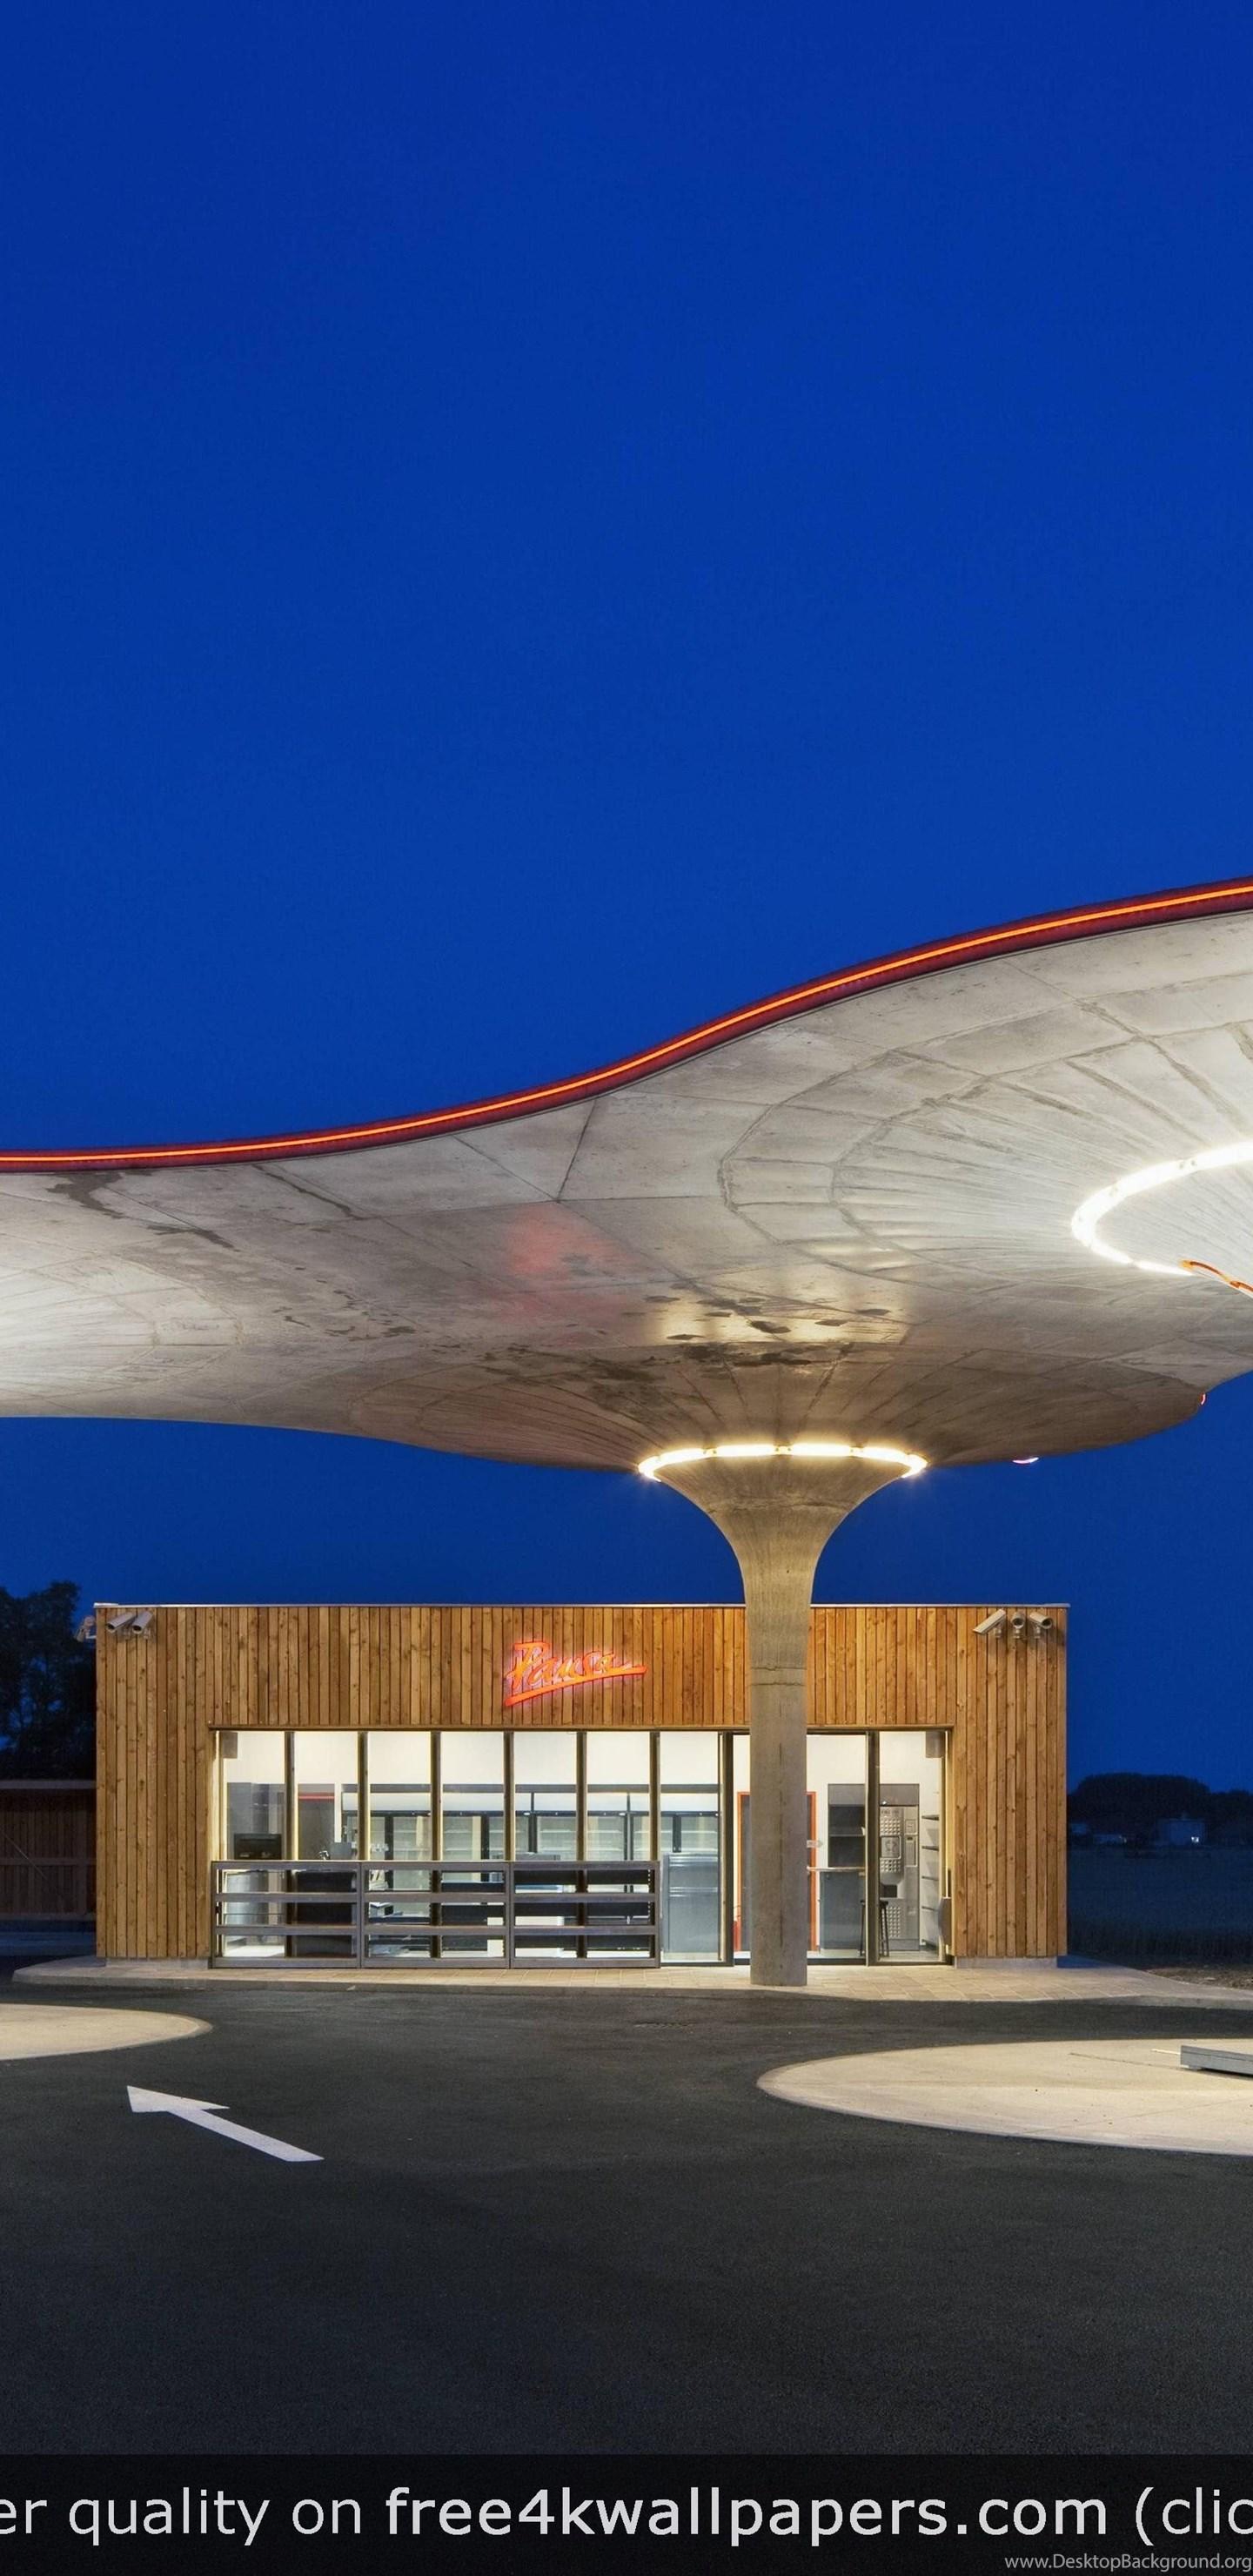 Gas Station In Slovakia 4K Wallpapers Desktop Background